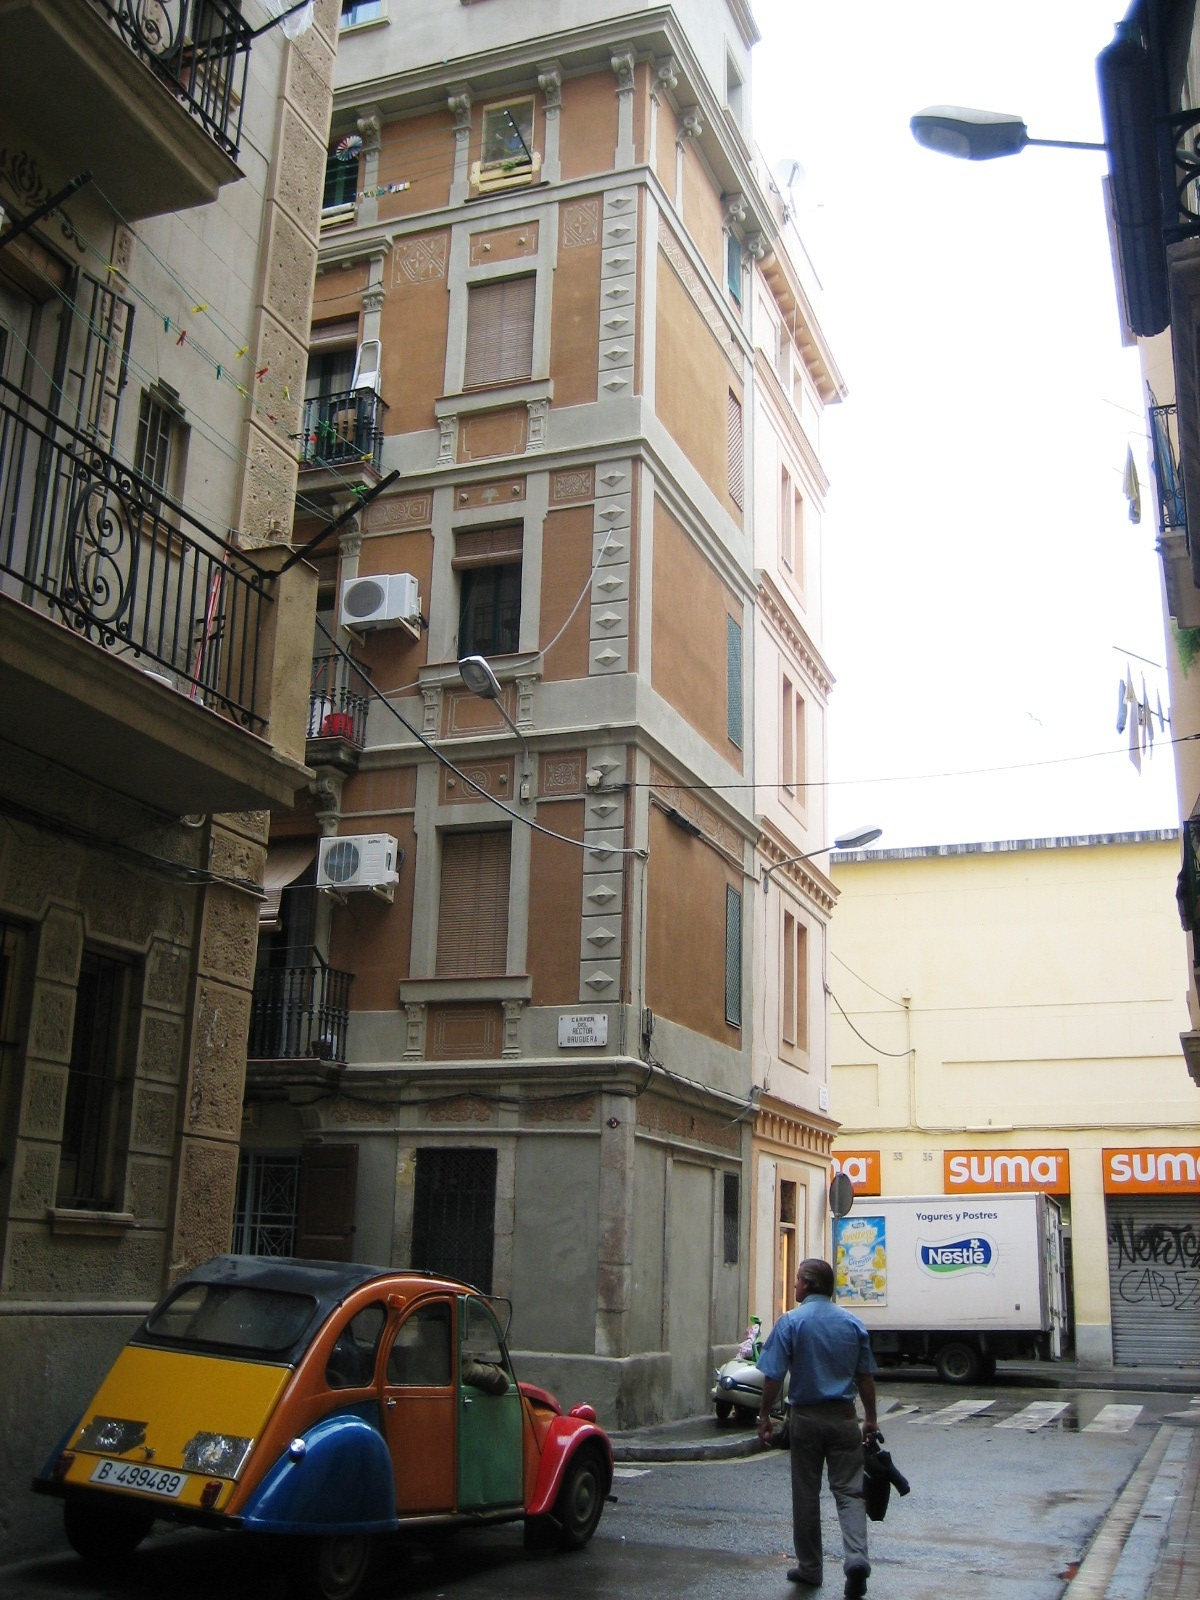 Une 2CV dans les rues du quartier de Barcelone : La Barceloneta